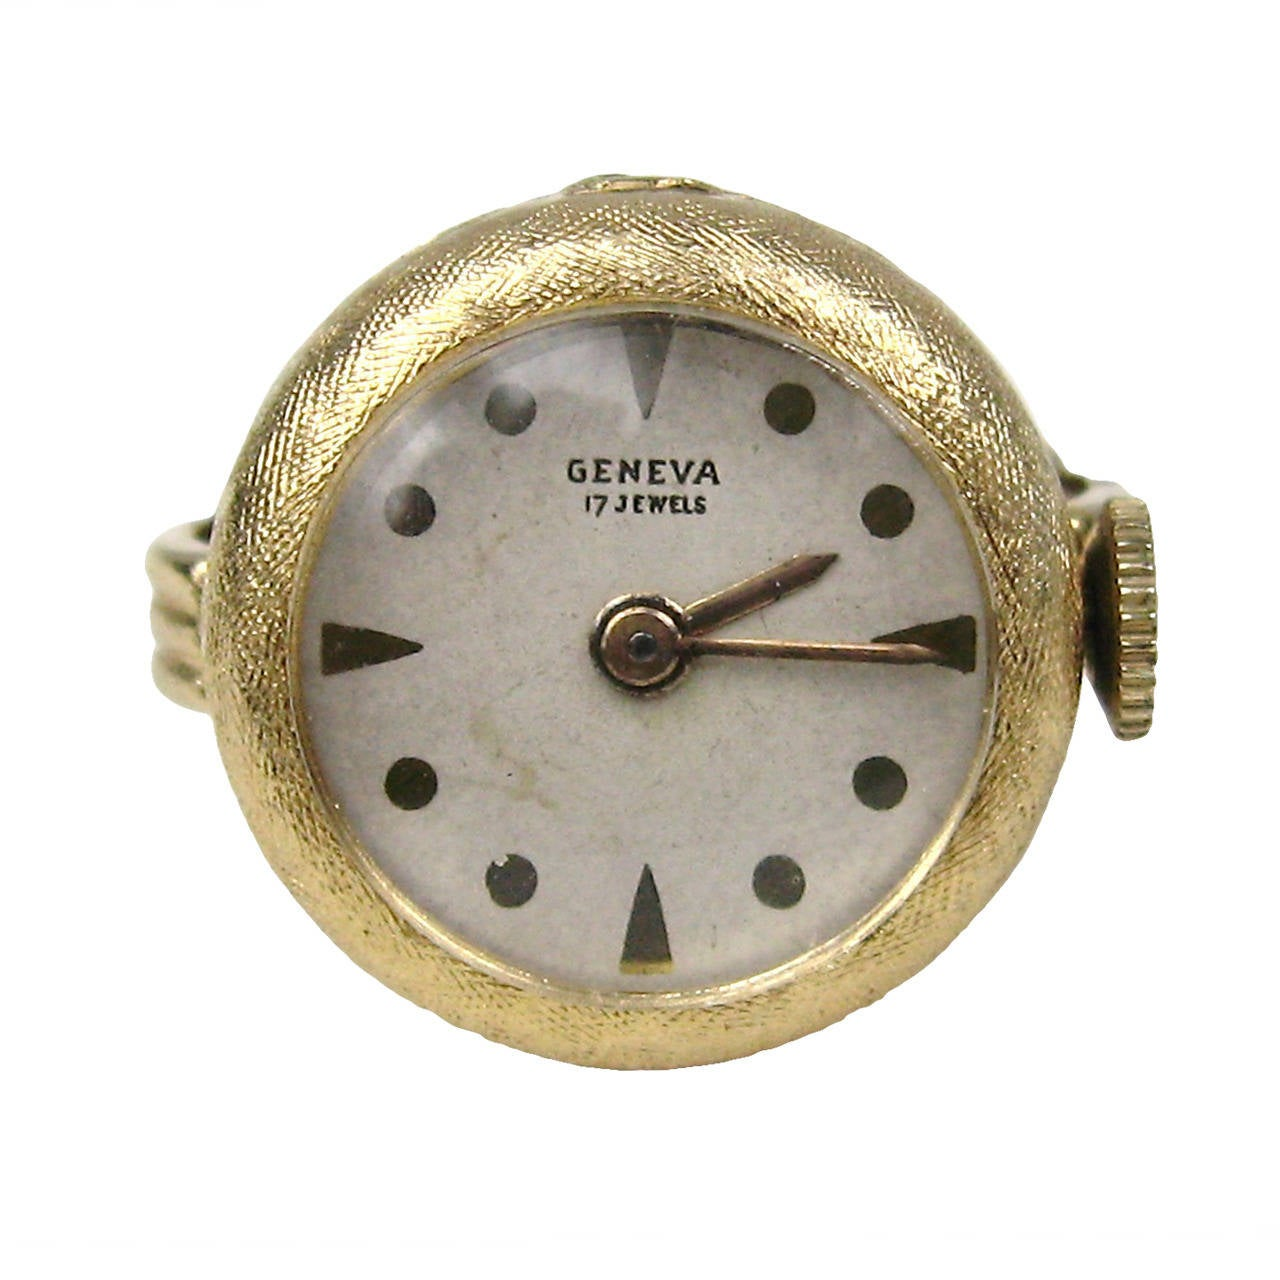 1960s 14k Gold Geneva 17 Jewel Watch Ring 1